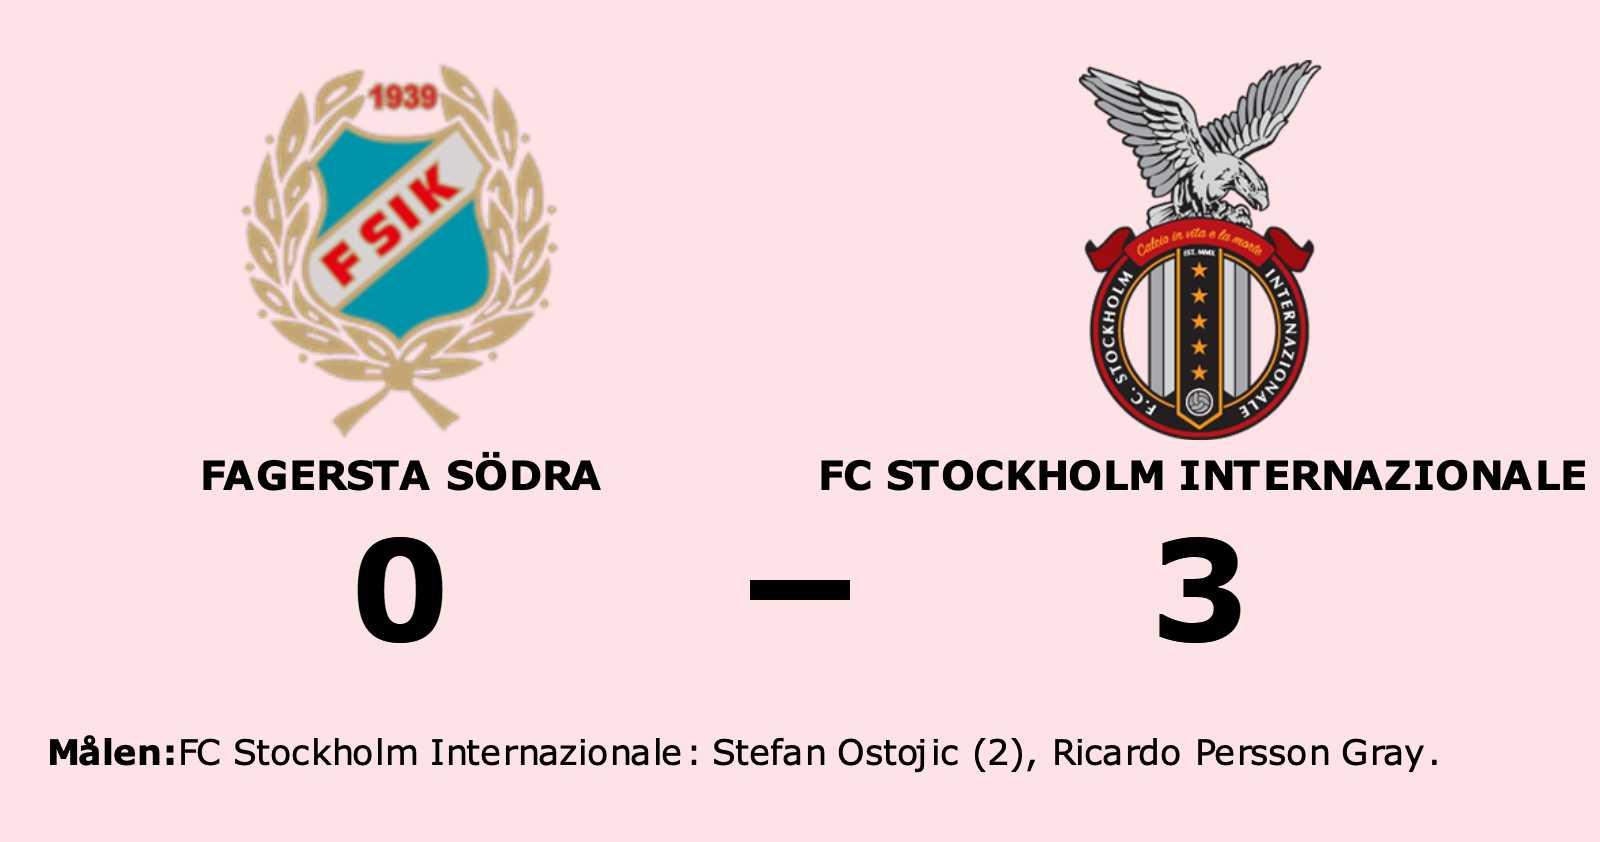 Stefan Ostojic gjorde två mål när FC Stockholm Internazionale vann